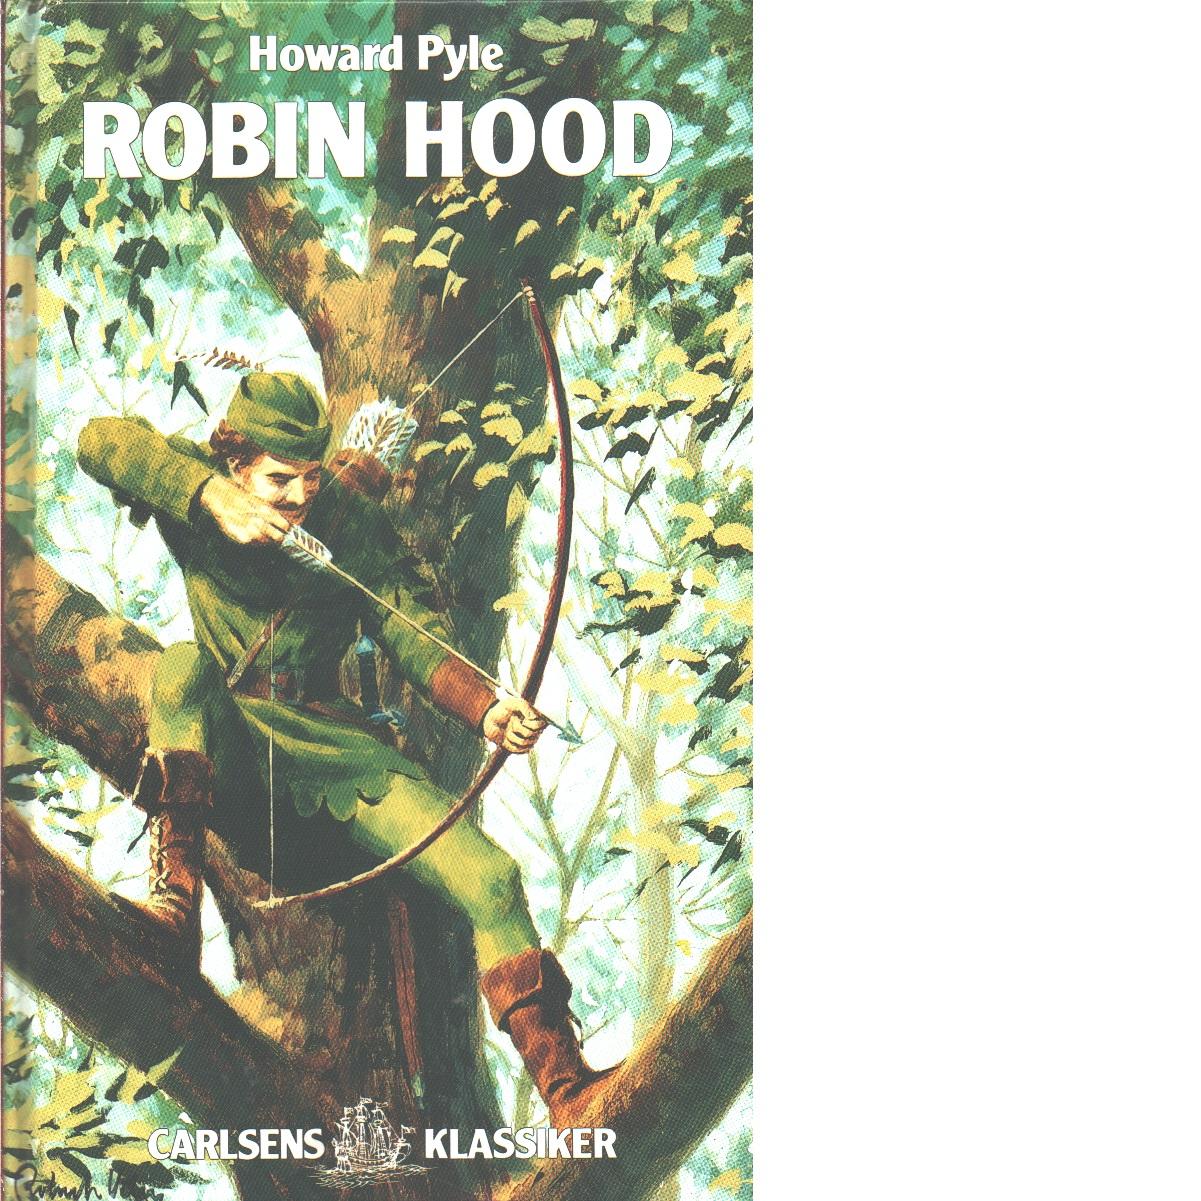 Robin Hood - Pyle, Howard